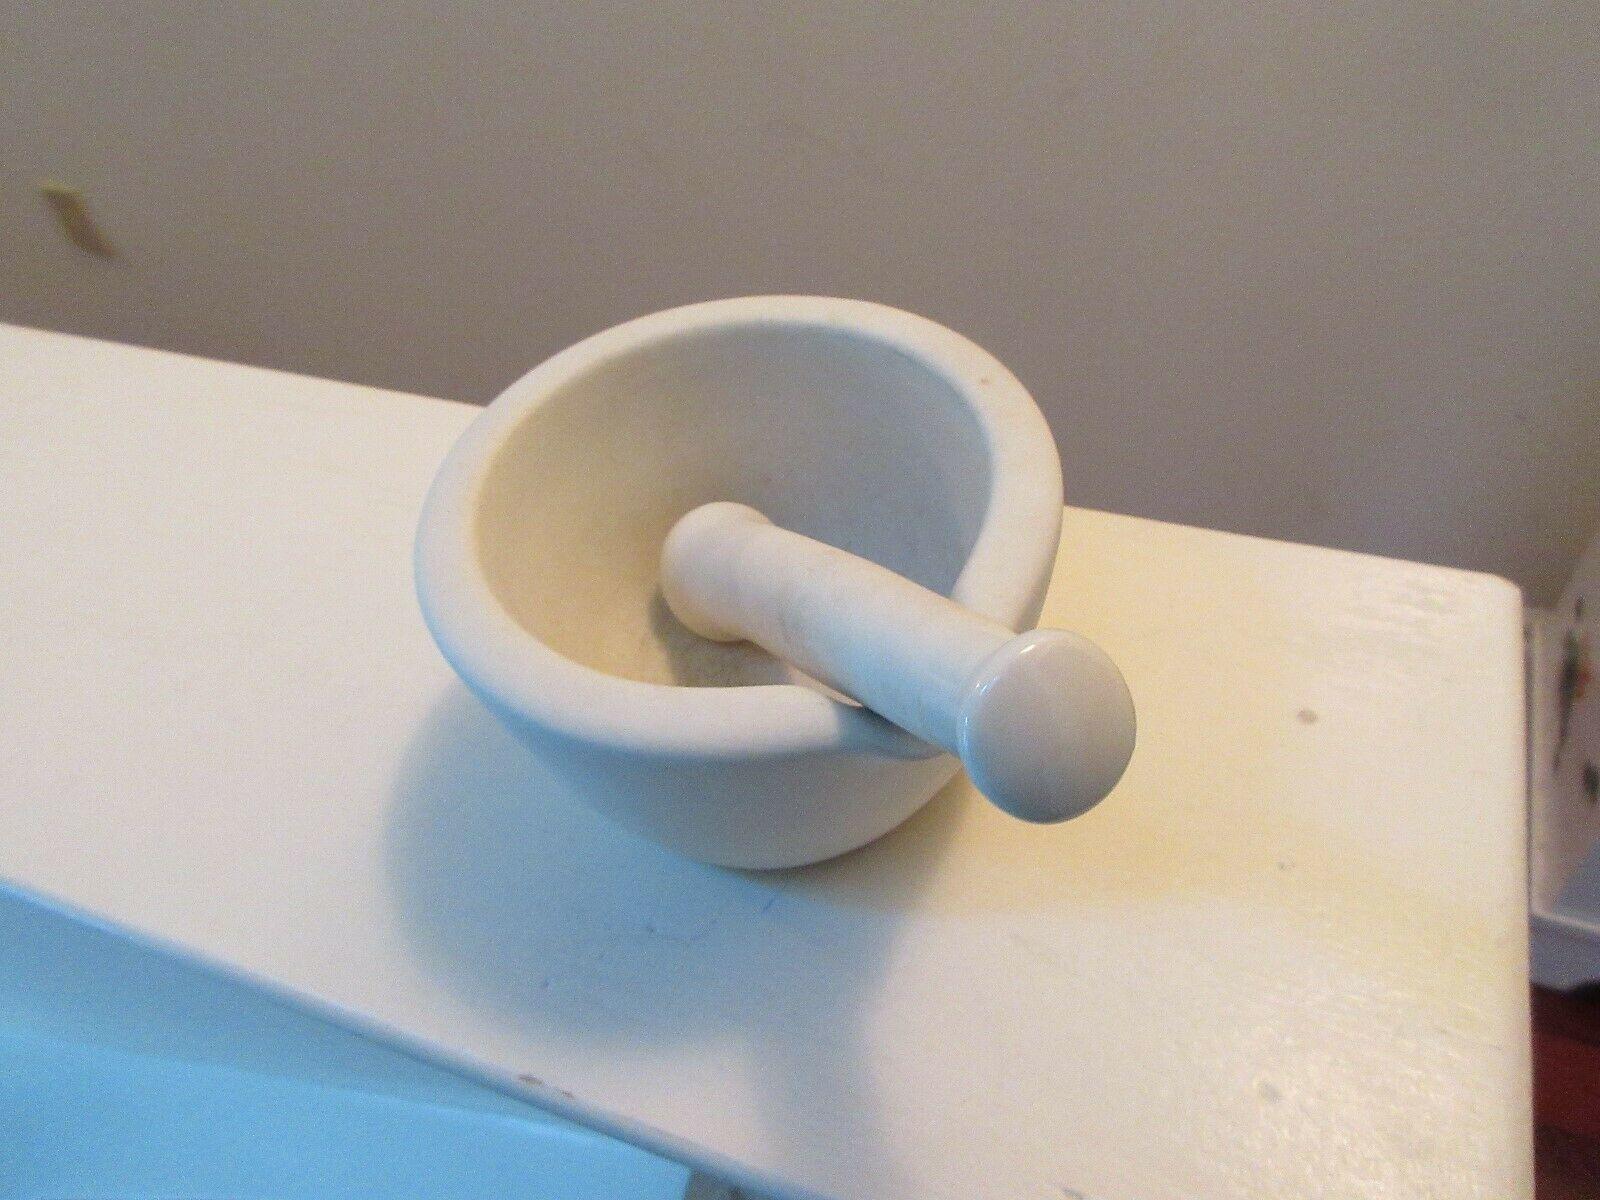 "White Ceramic Mortar Pestle Set 5"" Diameter With Slot , #1 Mortar  #B Pestle  image 3"